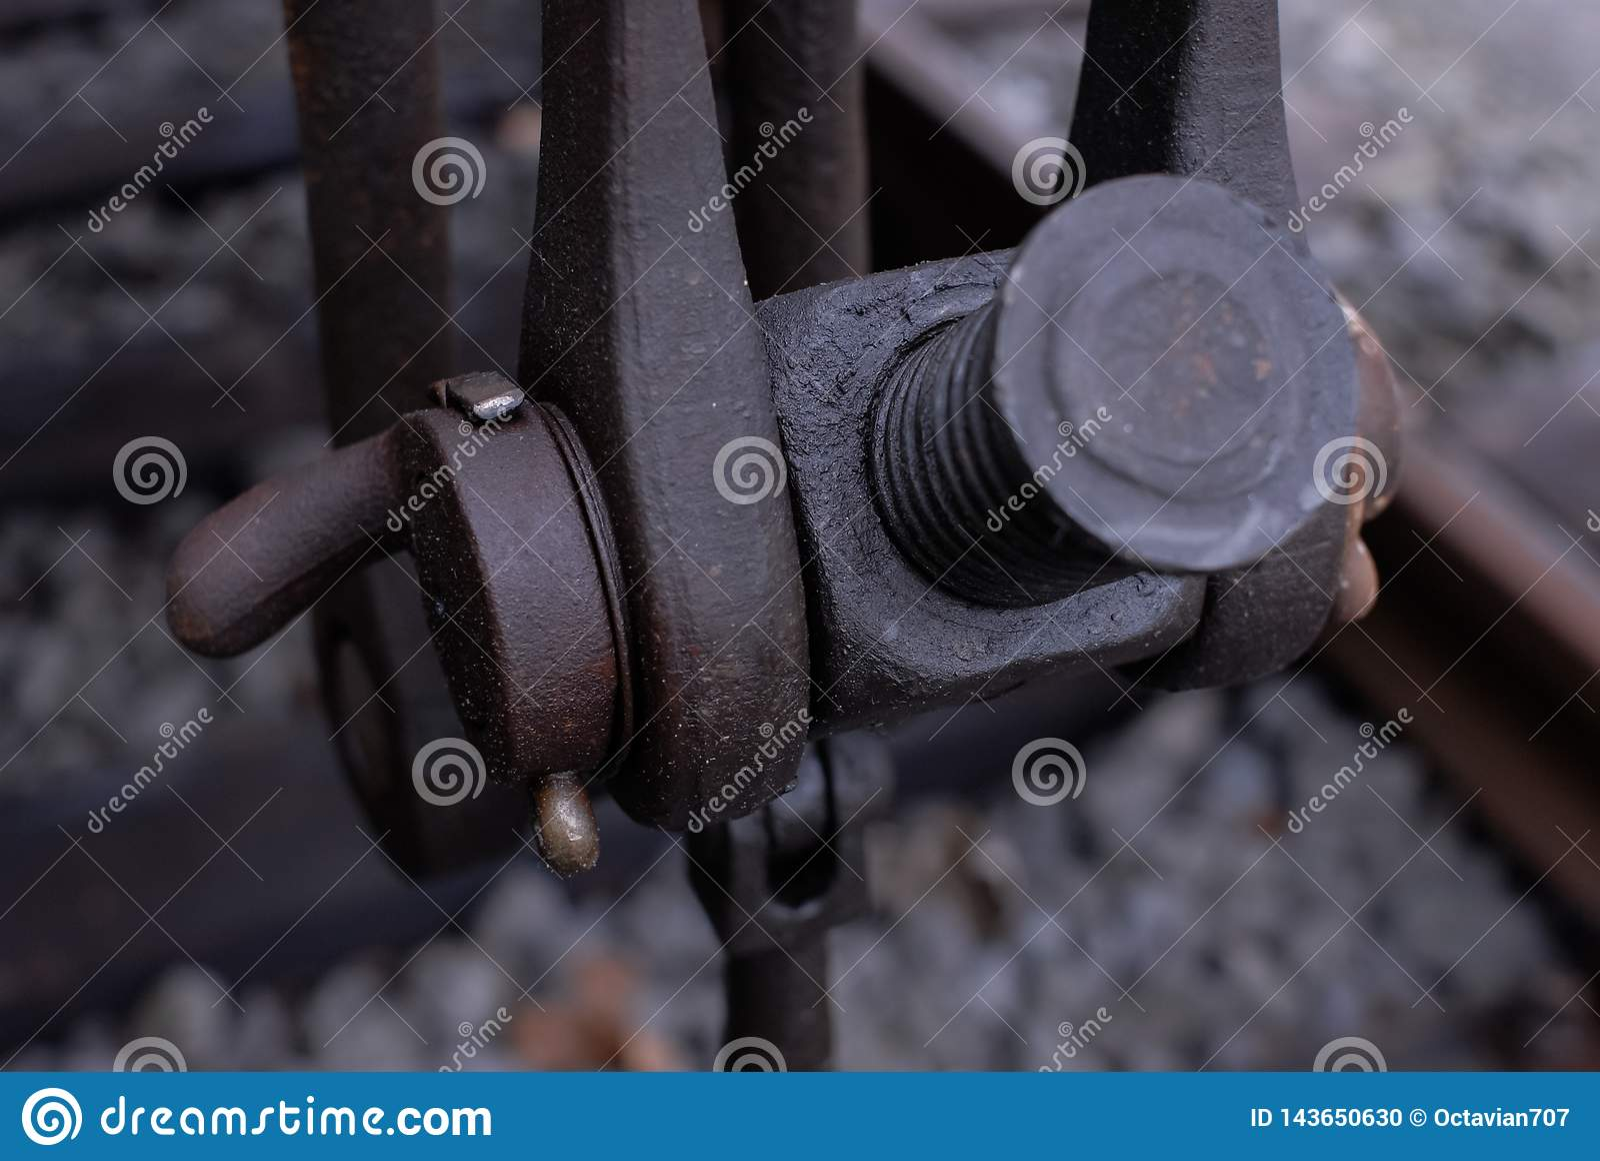 Kontaktdon mellan drevvagnar